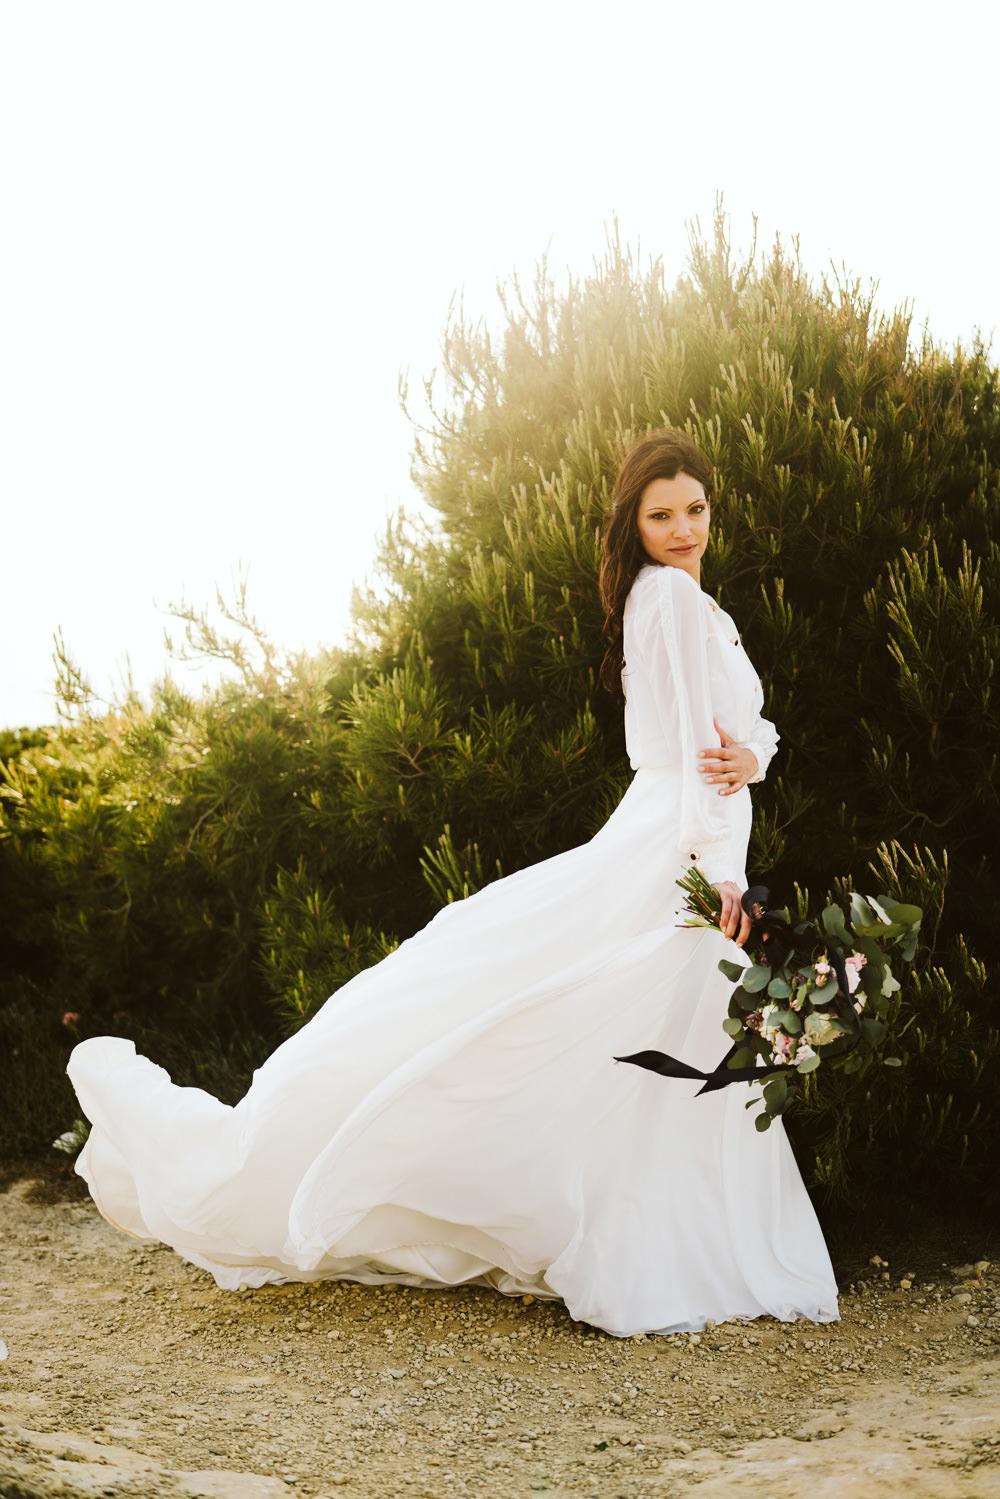 Dress Gown Bride Bridal Buttons Skirt Long Sleeves Clifftop Portugal Wedding Ideas John Barwood Photography